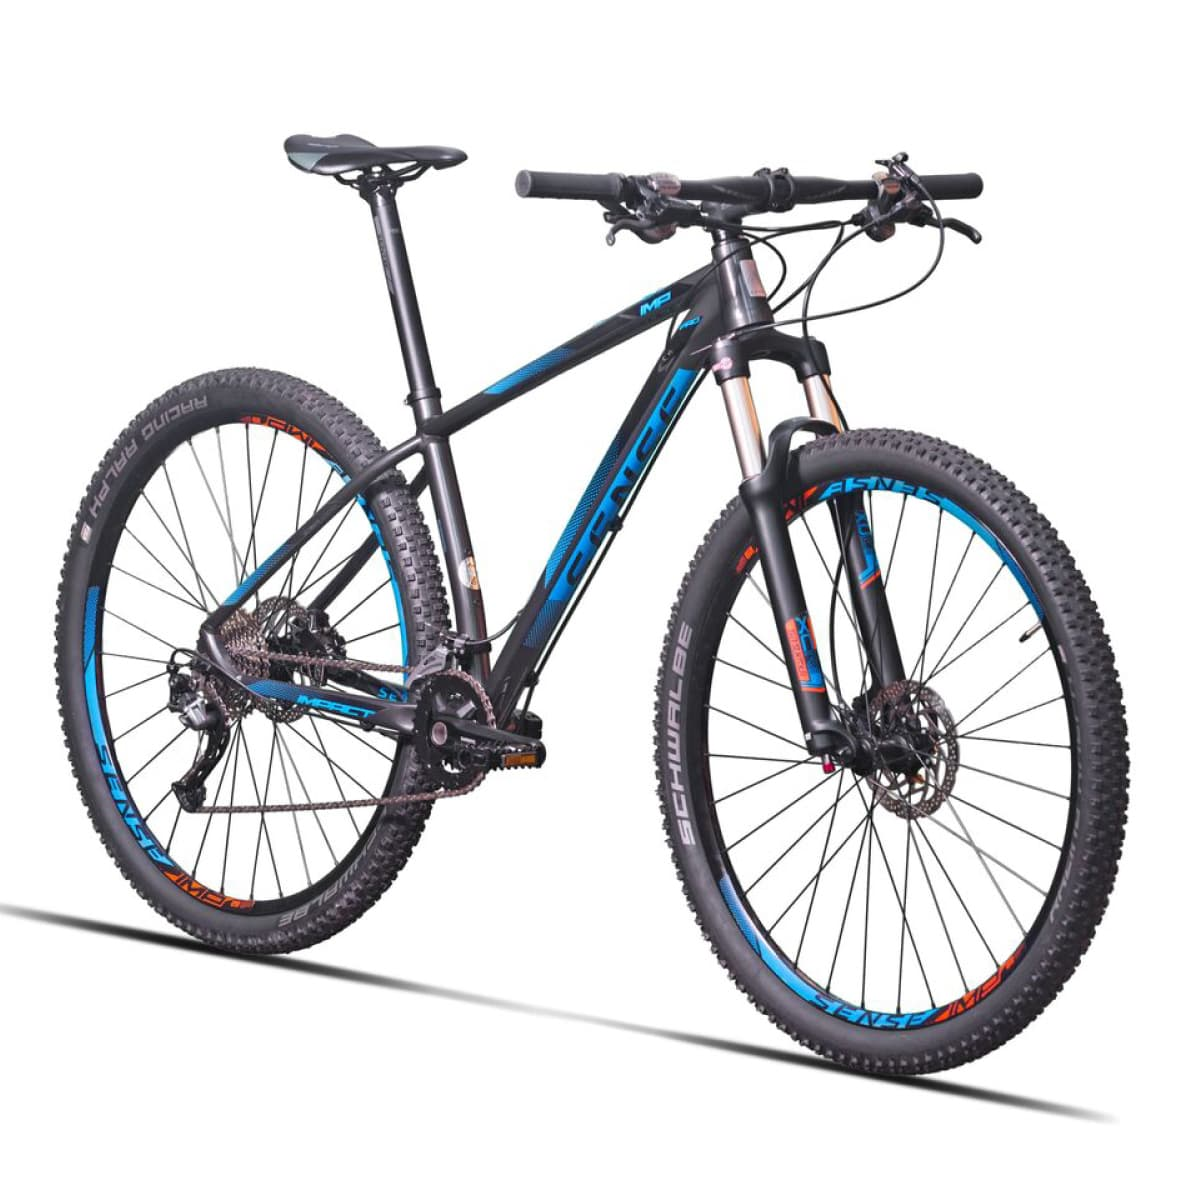 f00f2cfb8 Bike Sense Impact Pro 2019 18V Shimano Alivio - Life Pedal ...